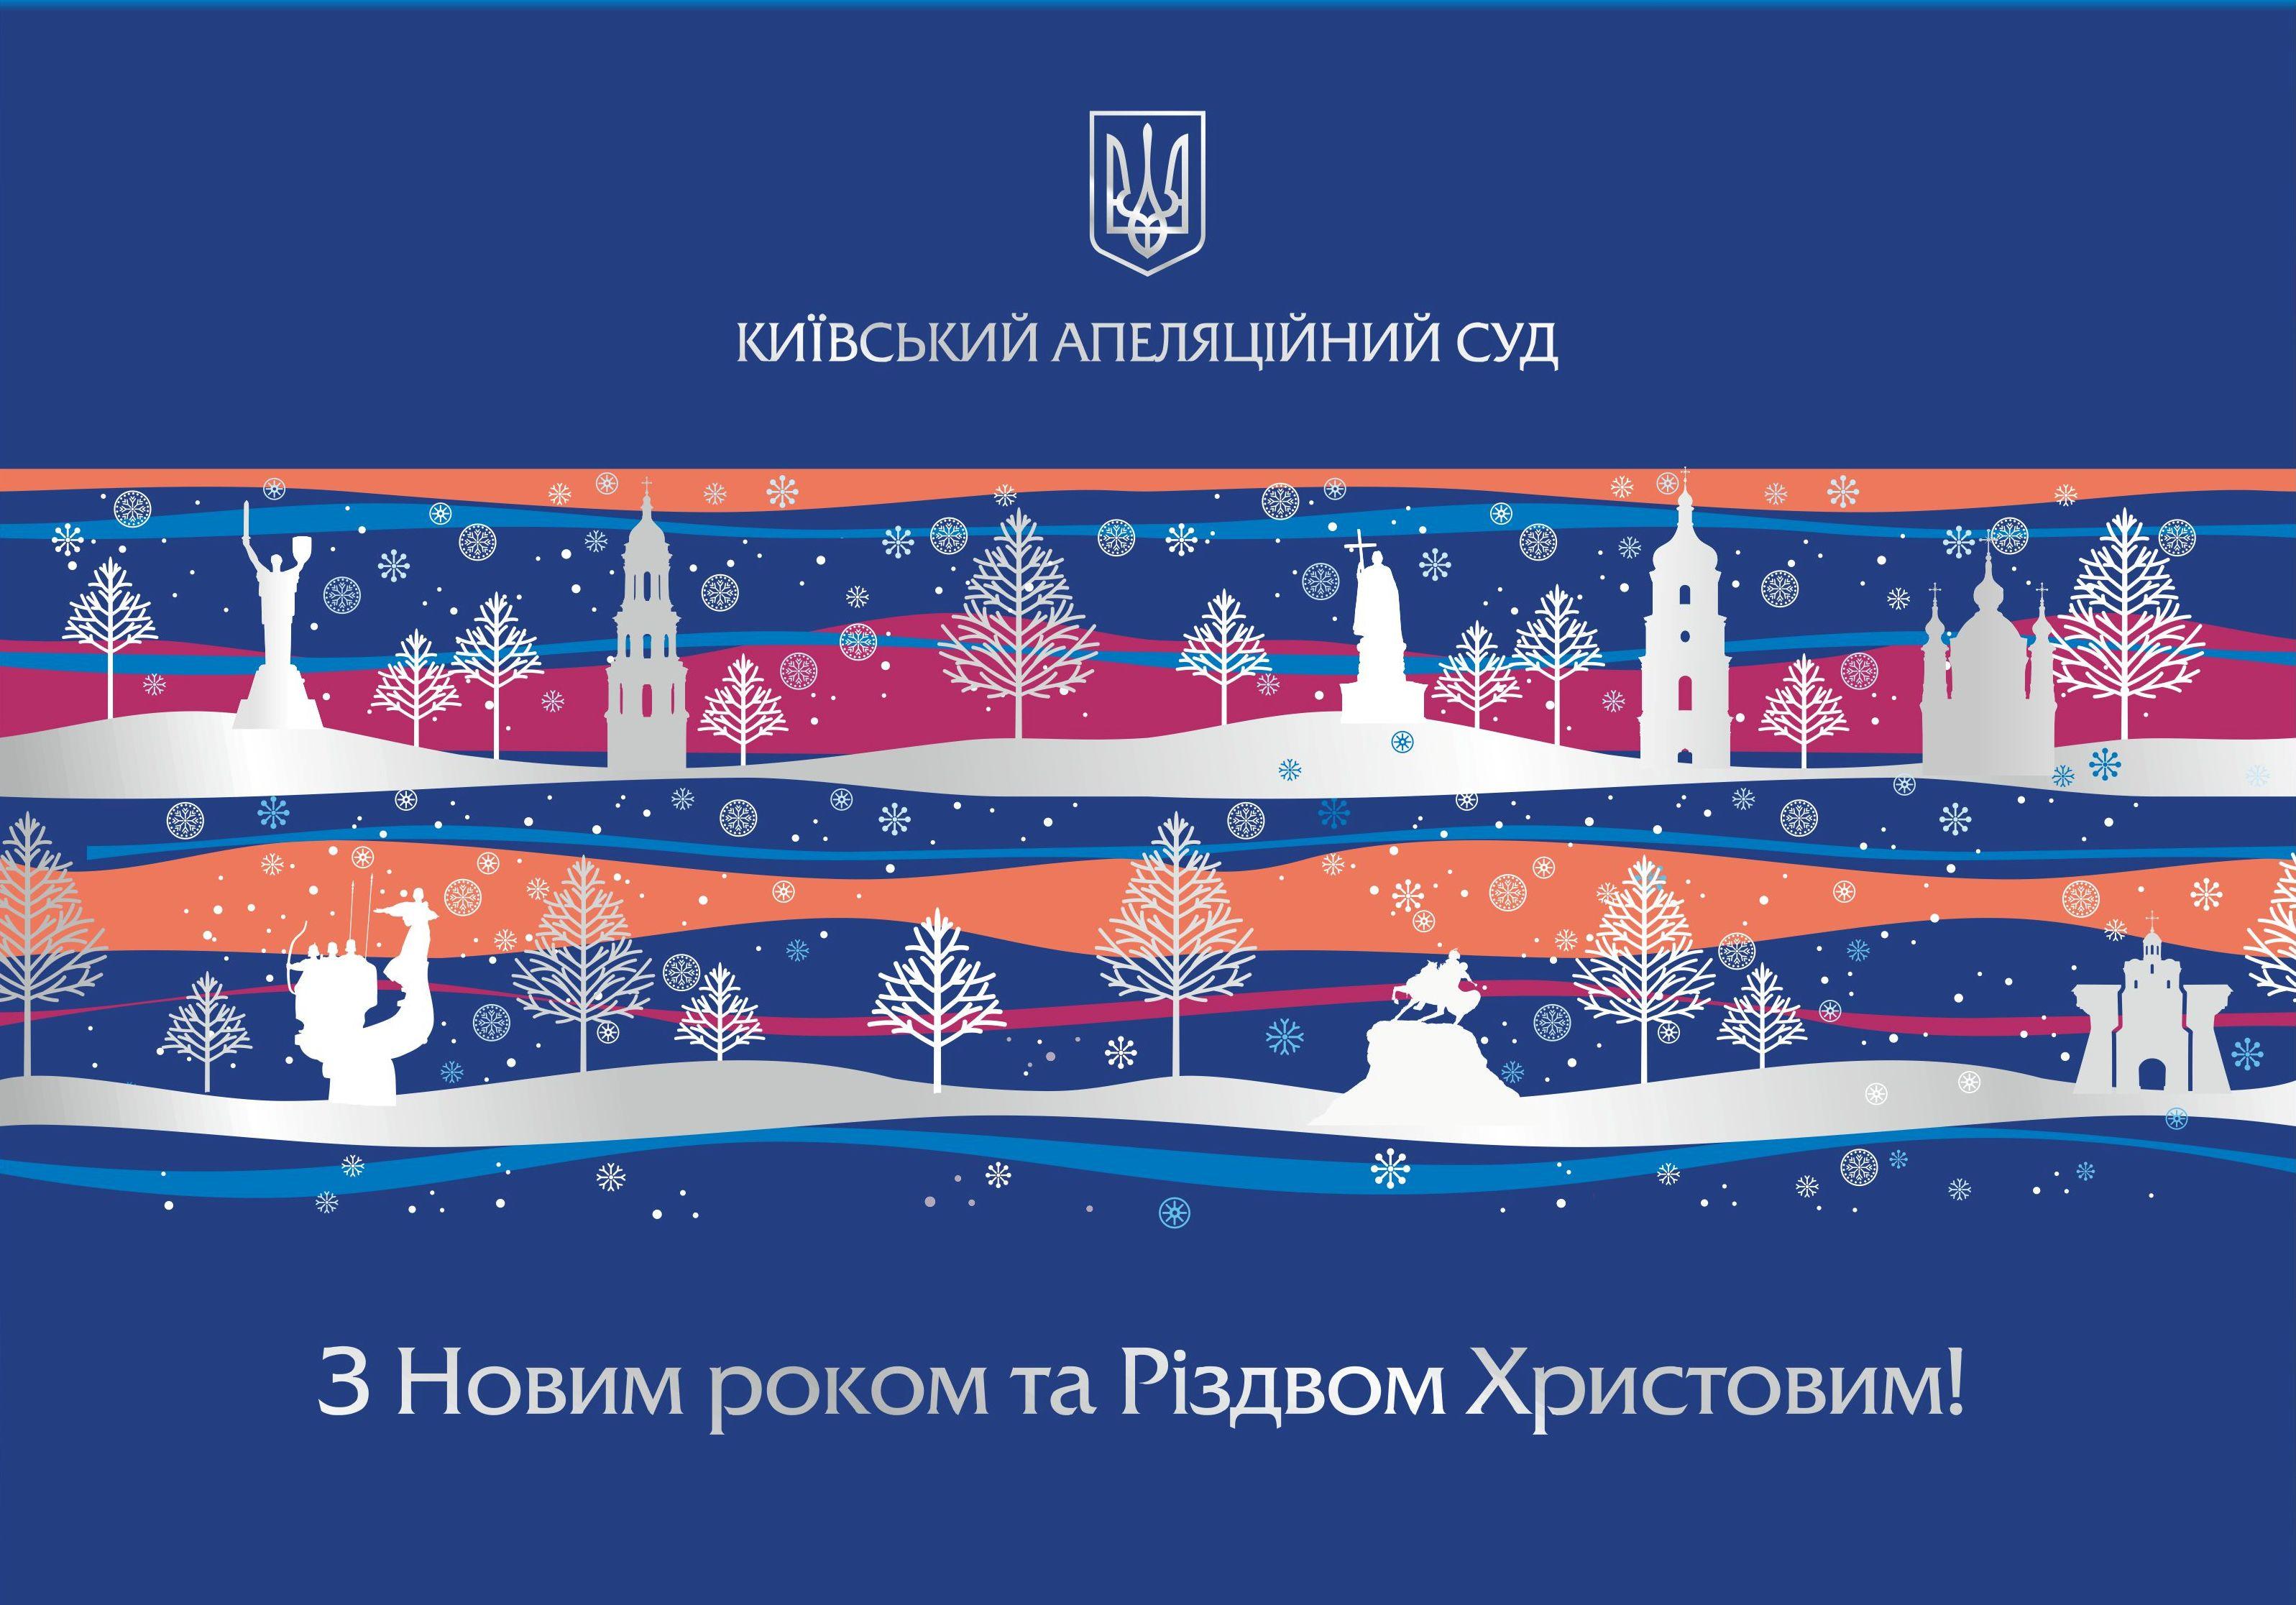 Kiev Appeal Court_Christmas Card 2019_3